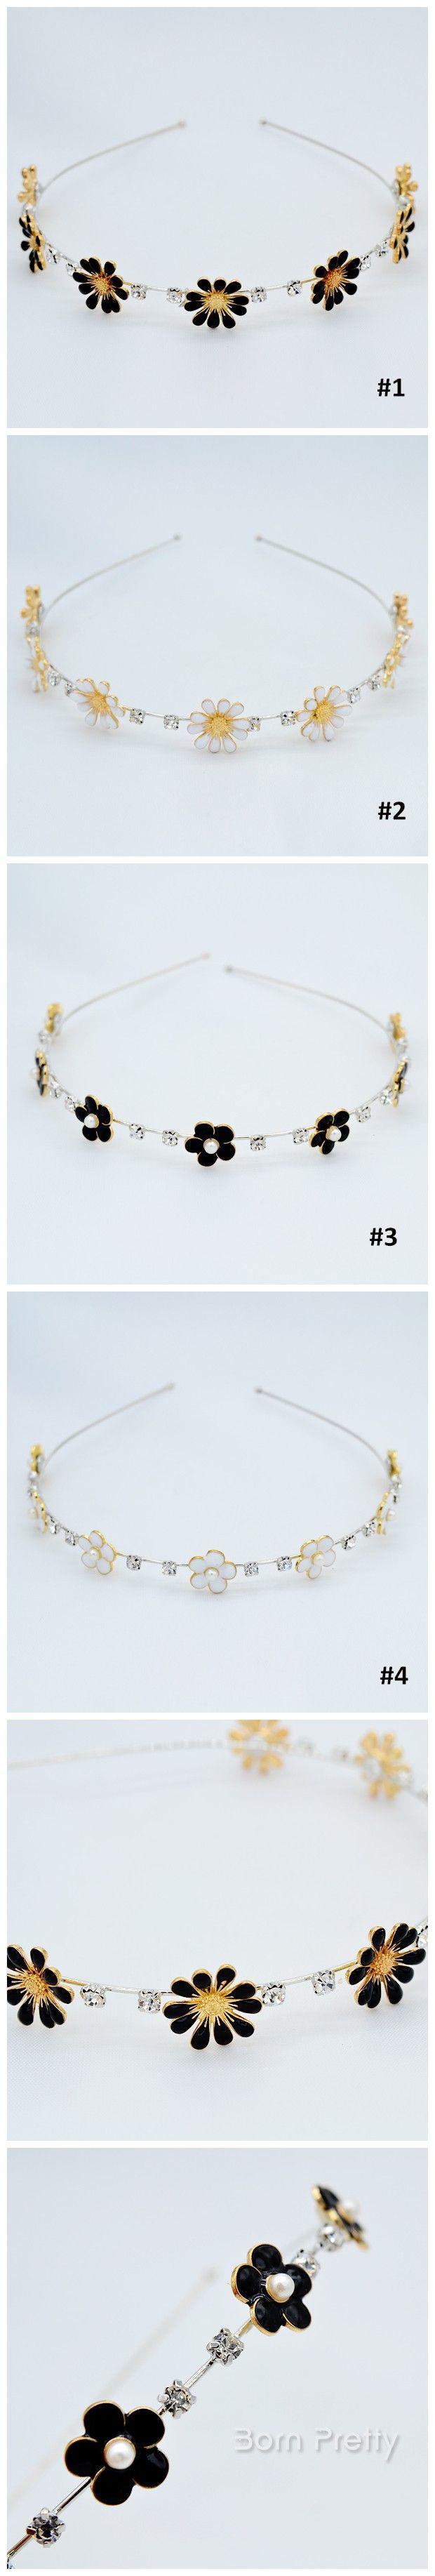 $2.84 1 Pc Black White Flowers Rhinestone Hair Band Delicate Flowers Head Band -4 Patterns - BornPrettyStore.com